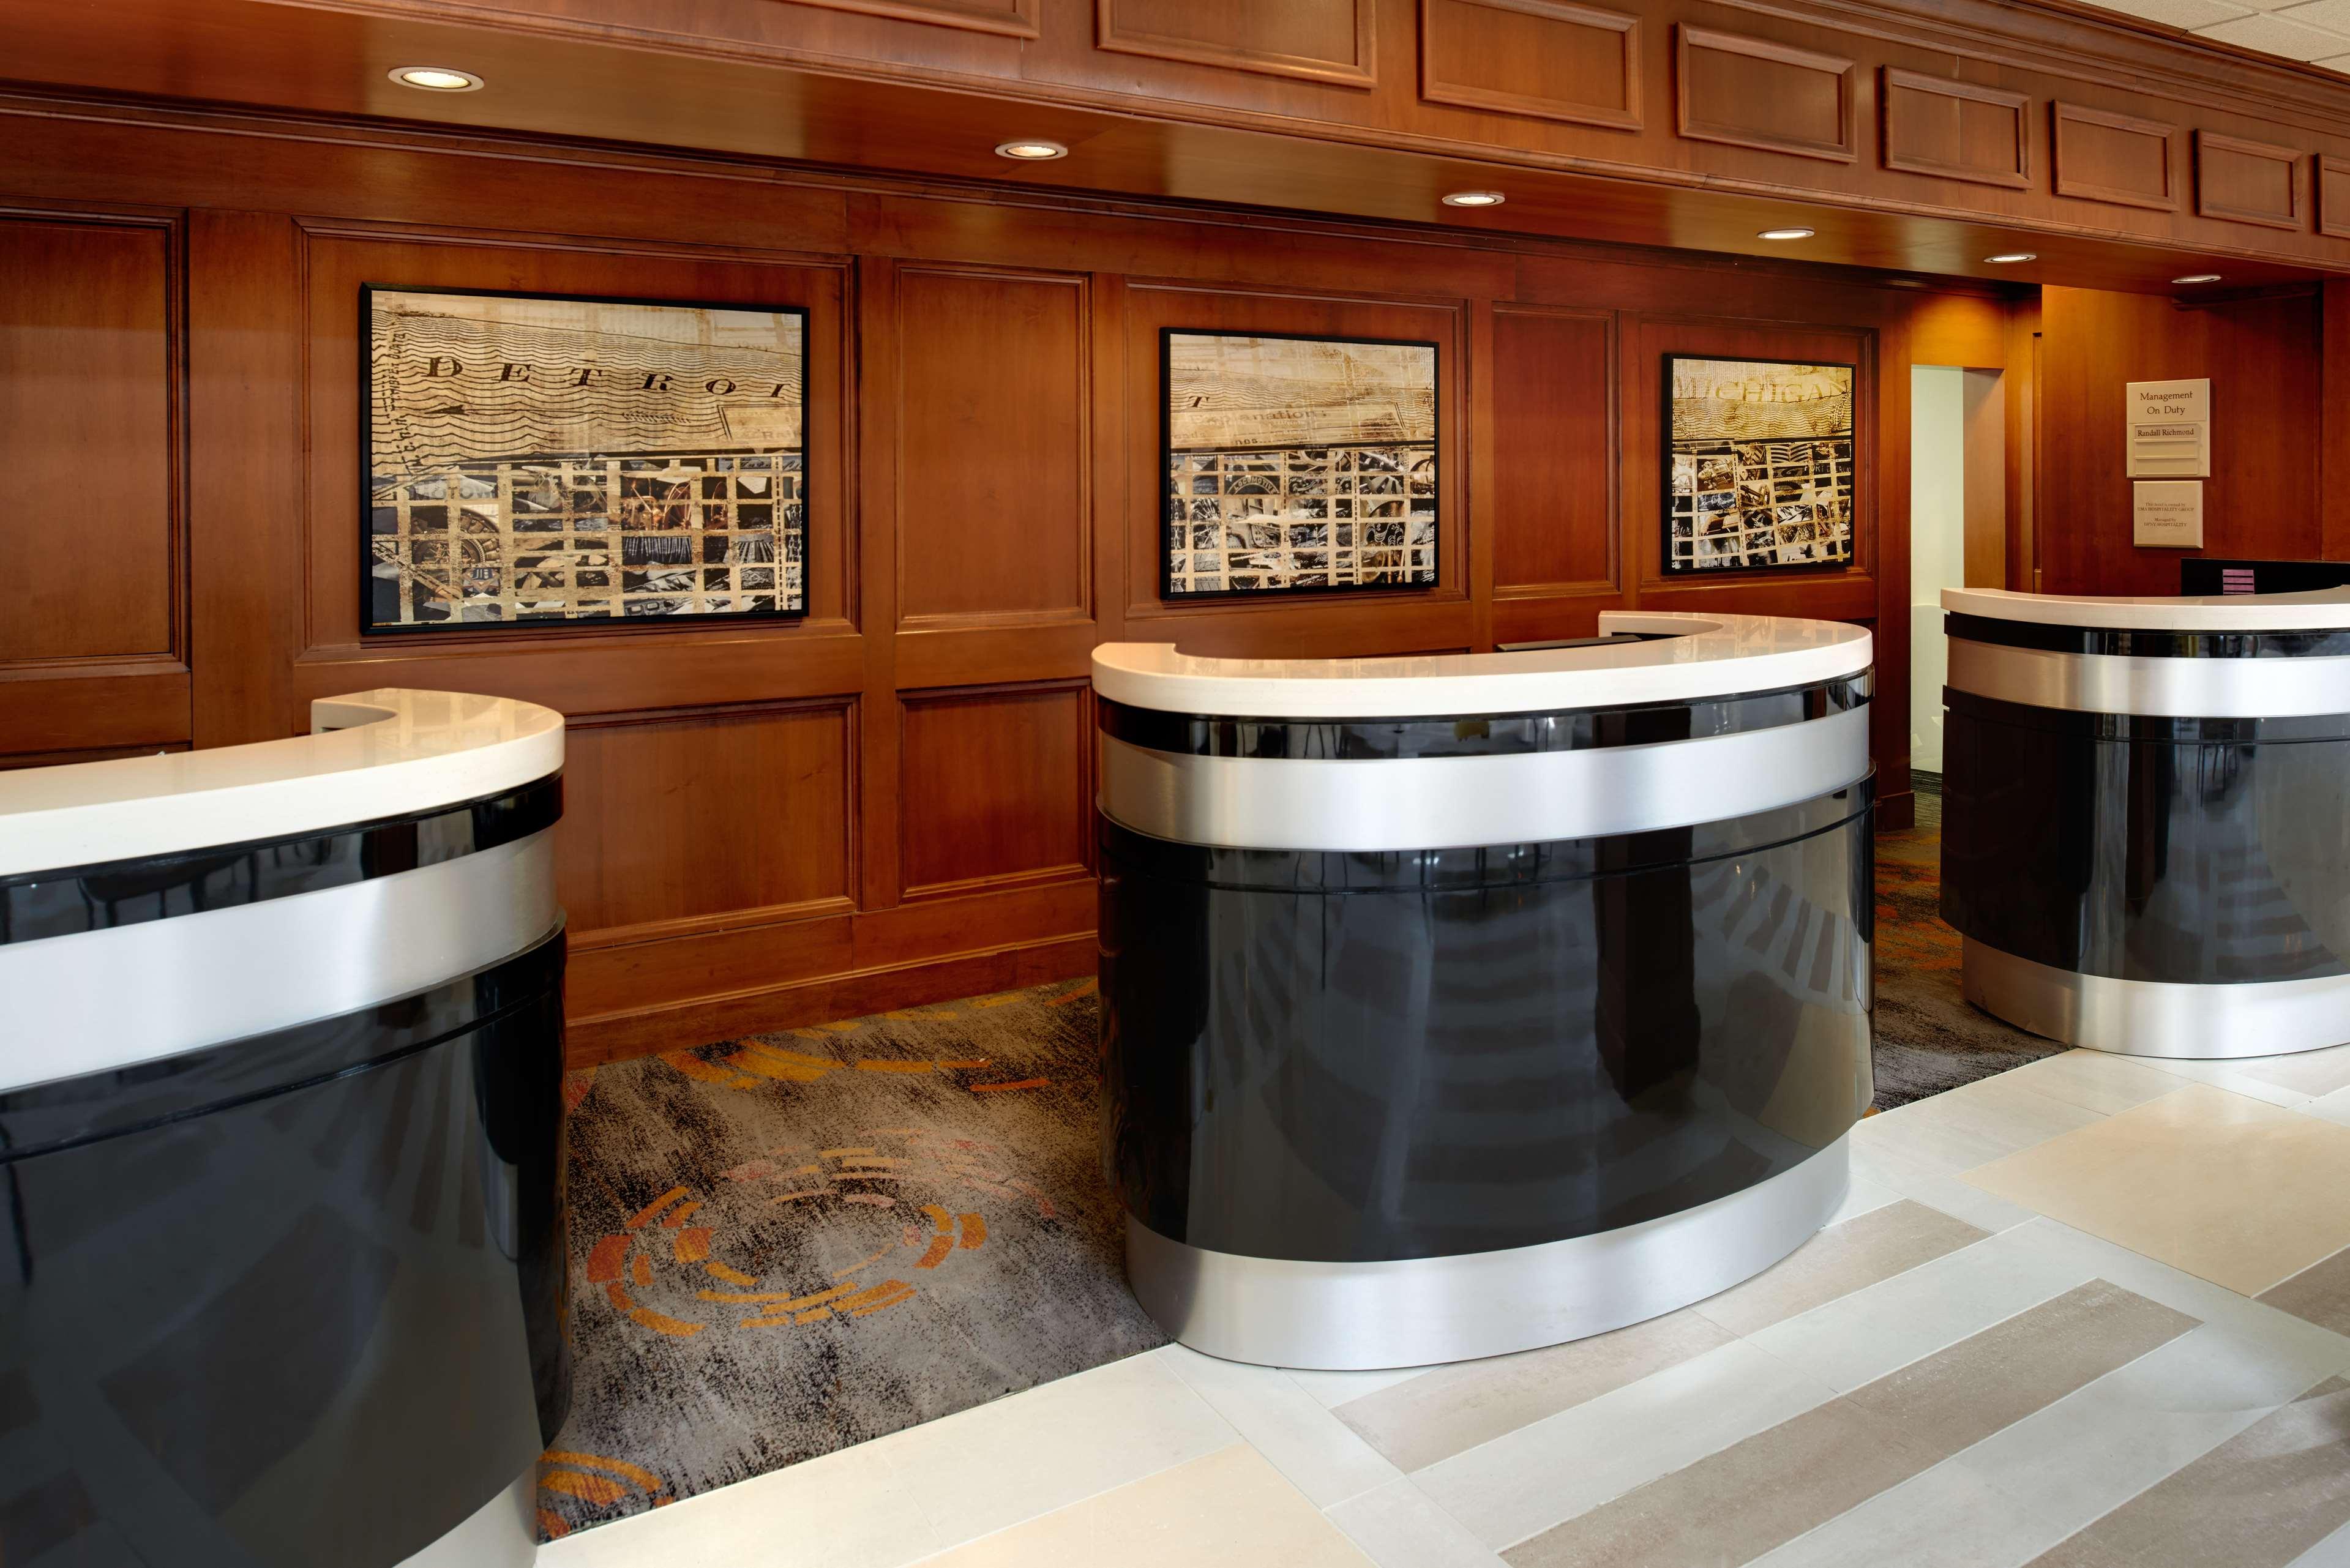 DoubleTree by Hilton Hotel Detroit - Dearborn image 5